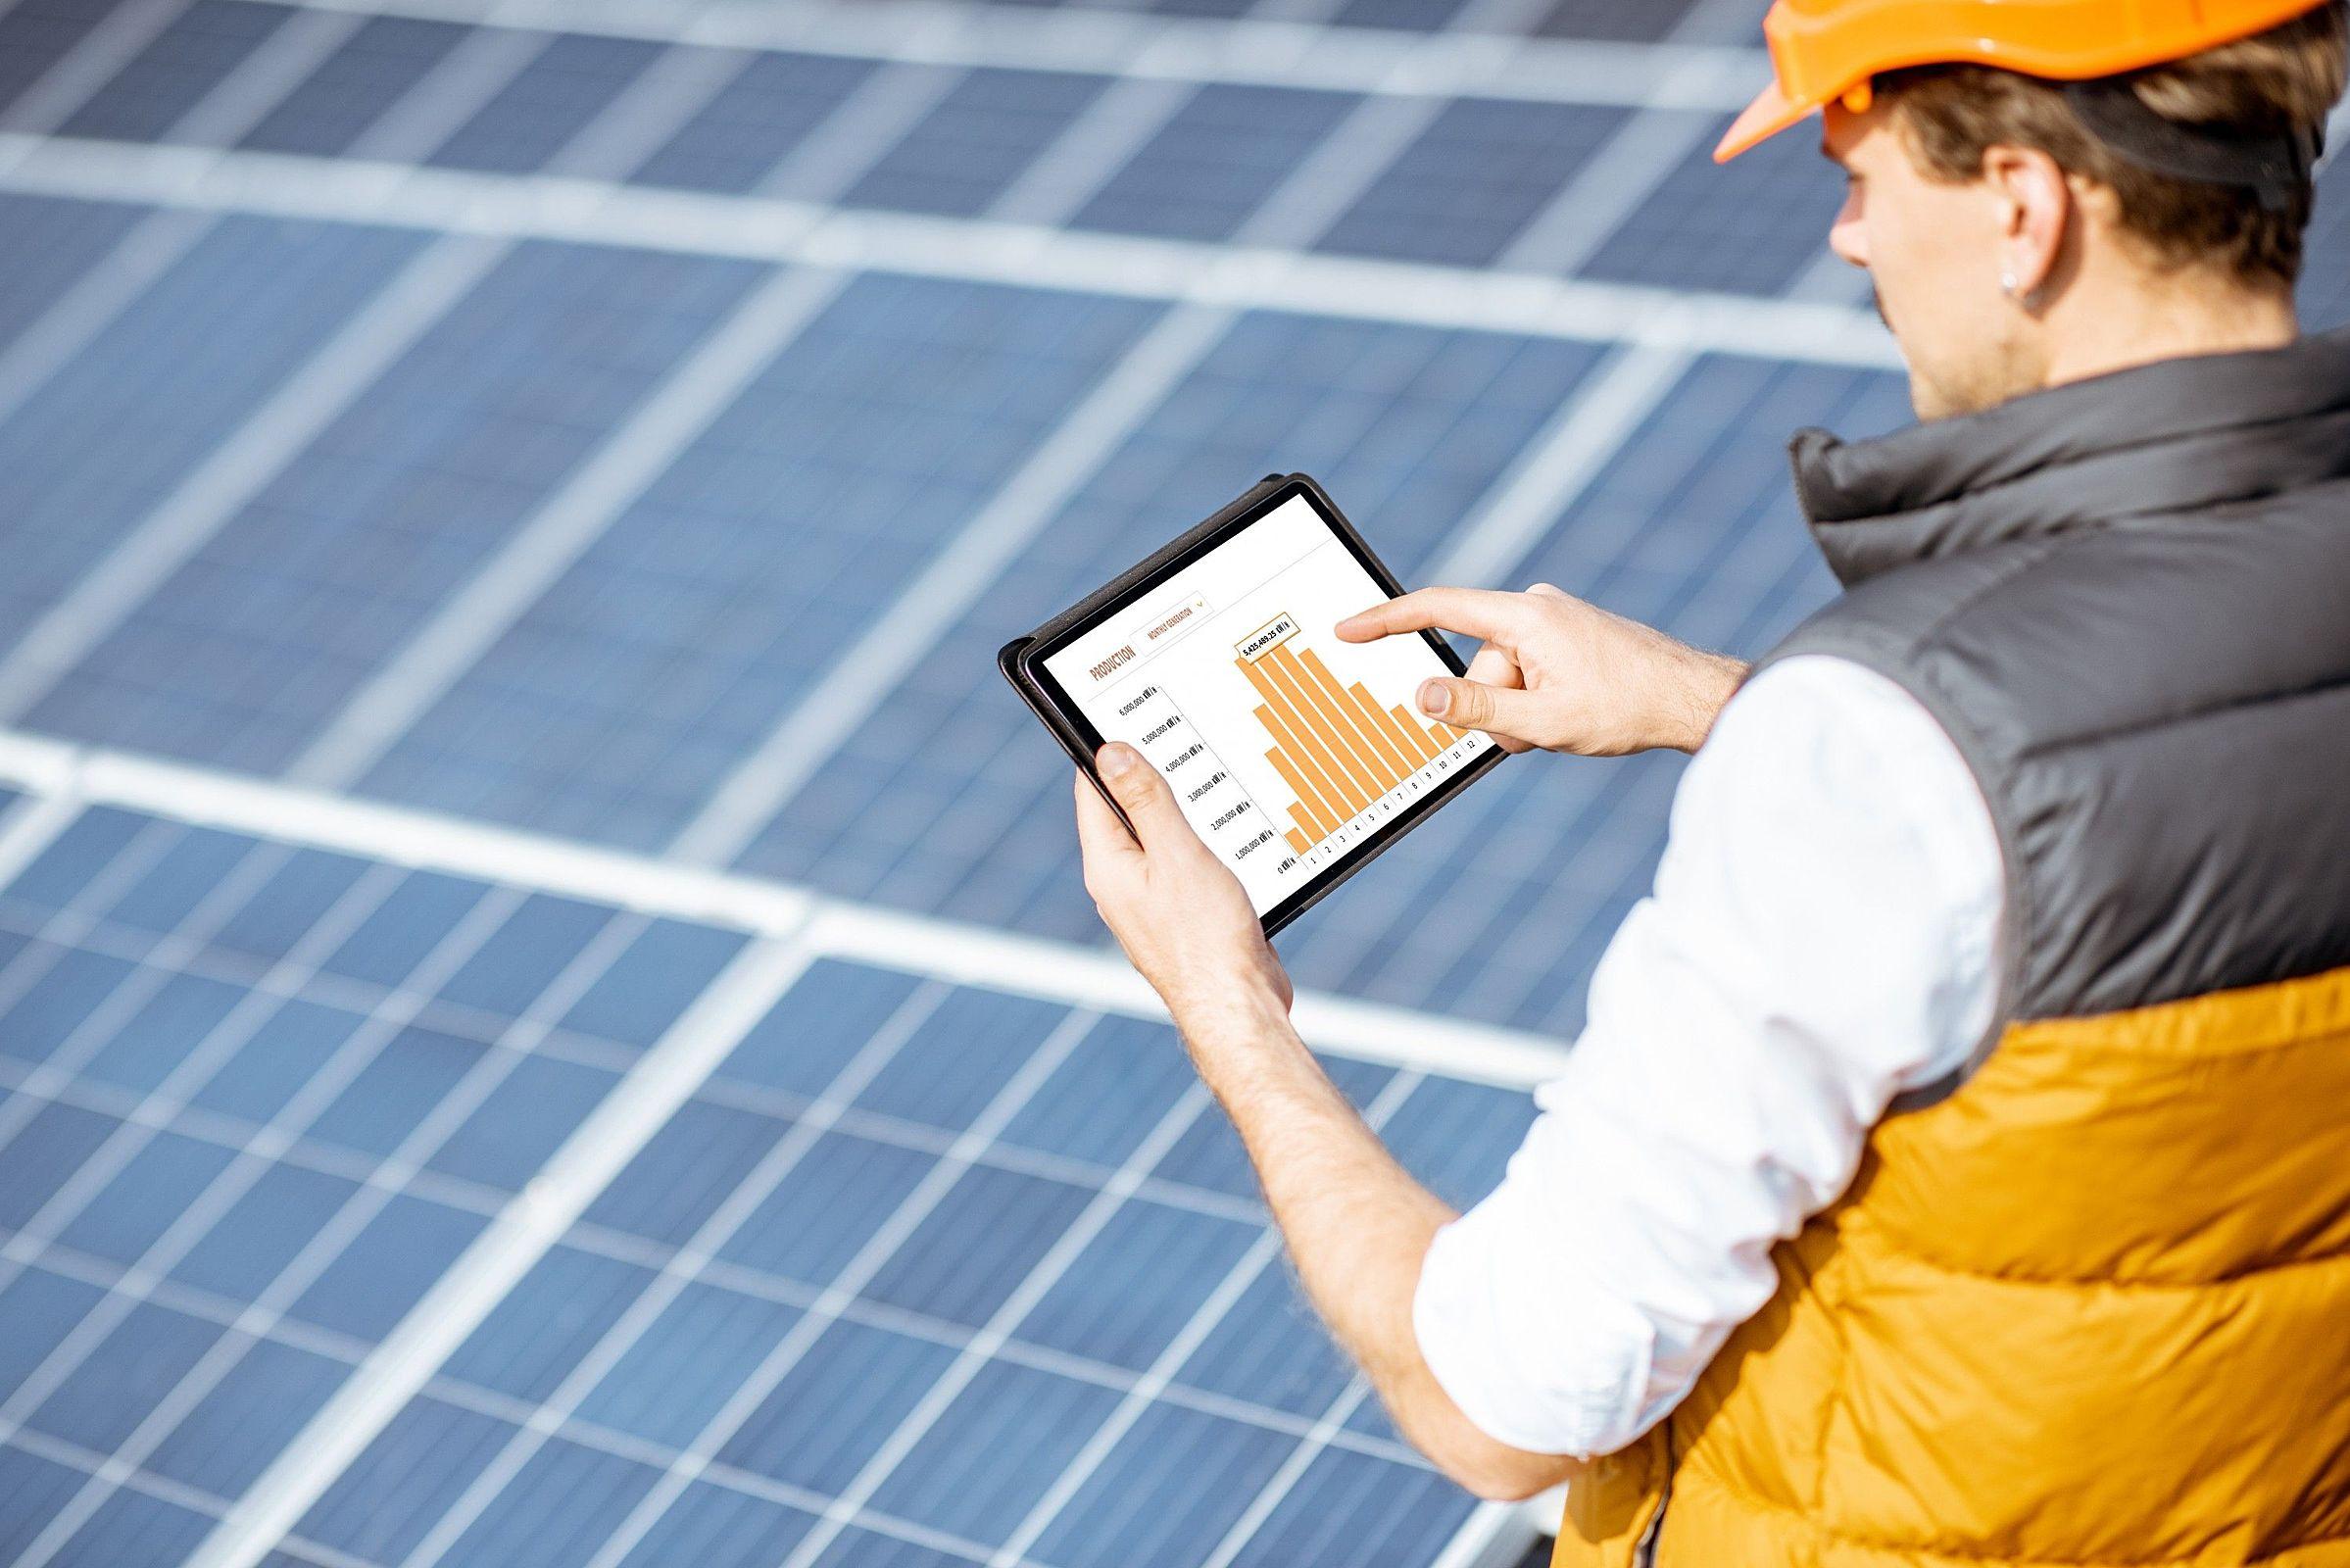 Sabia que a procura por sistemas de energia solar aumentou recentemente?